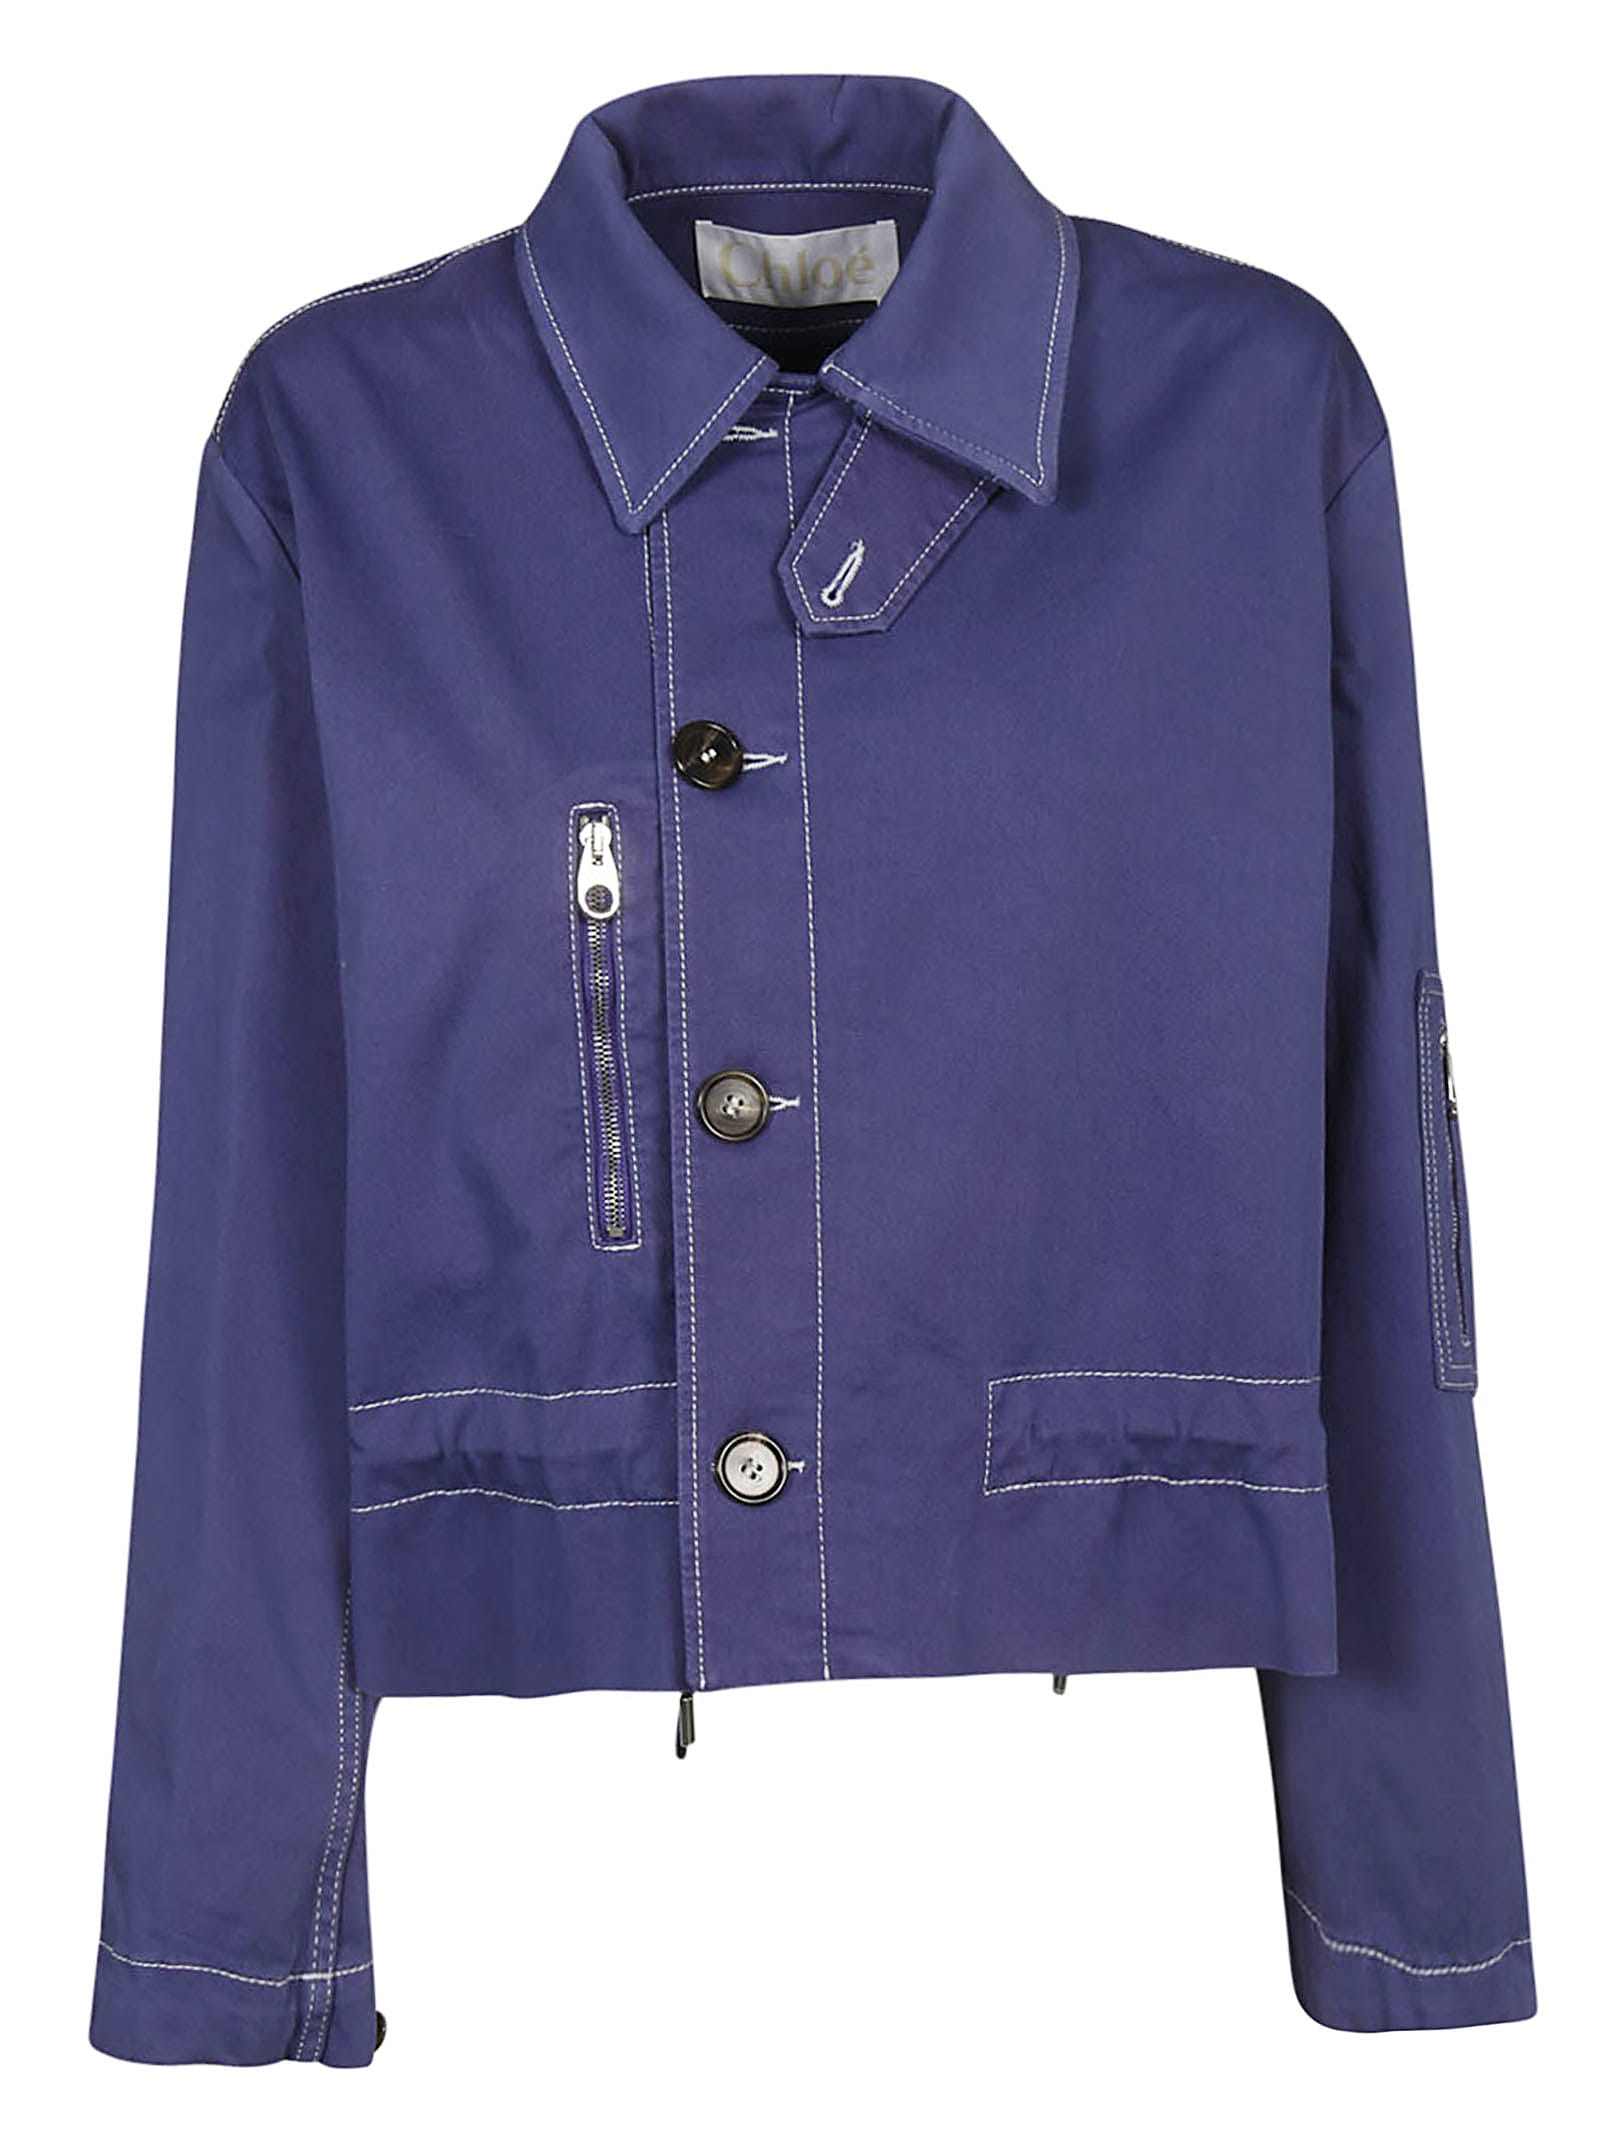 Chloé Buttoned Jacket